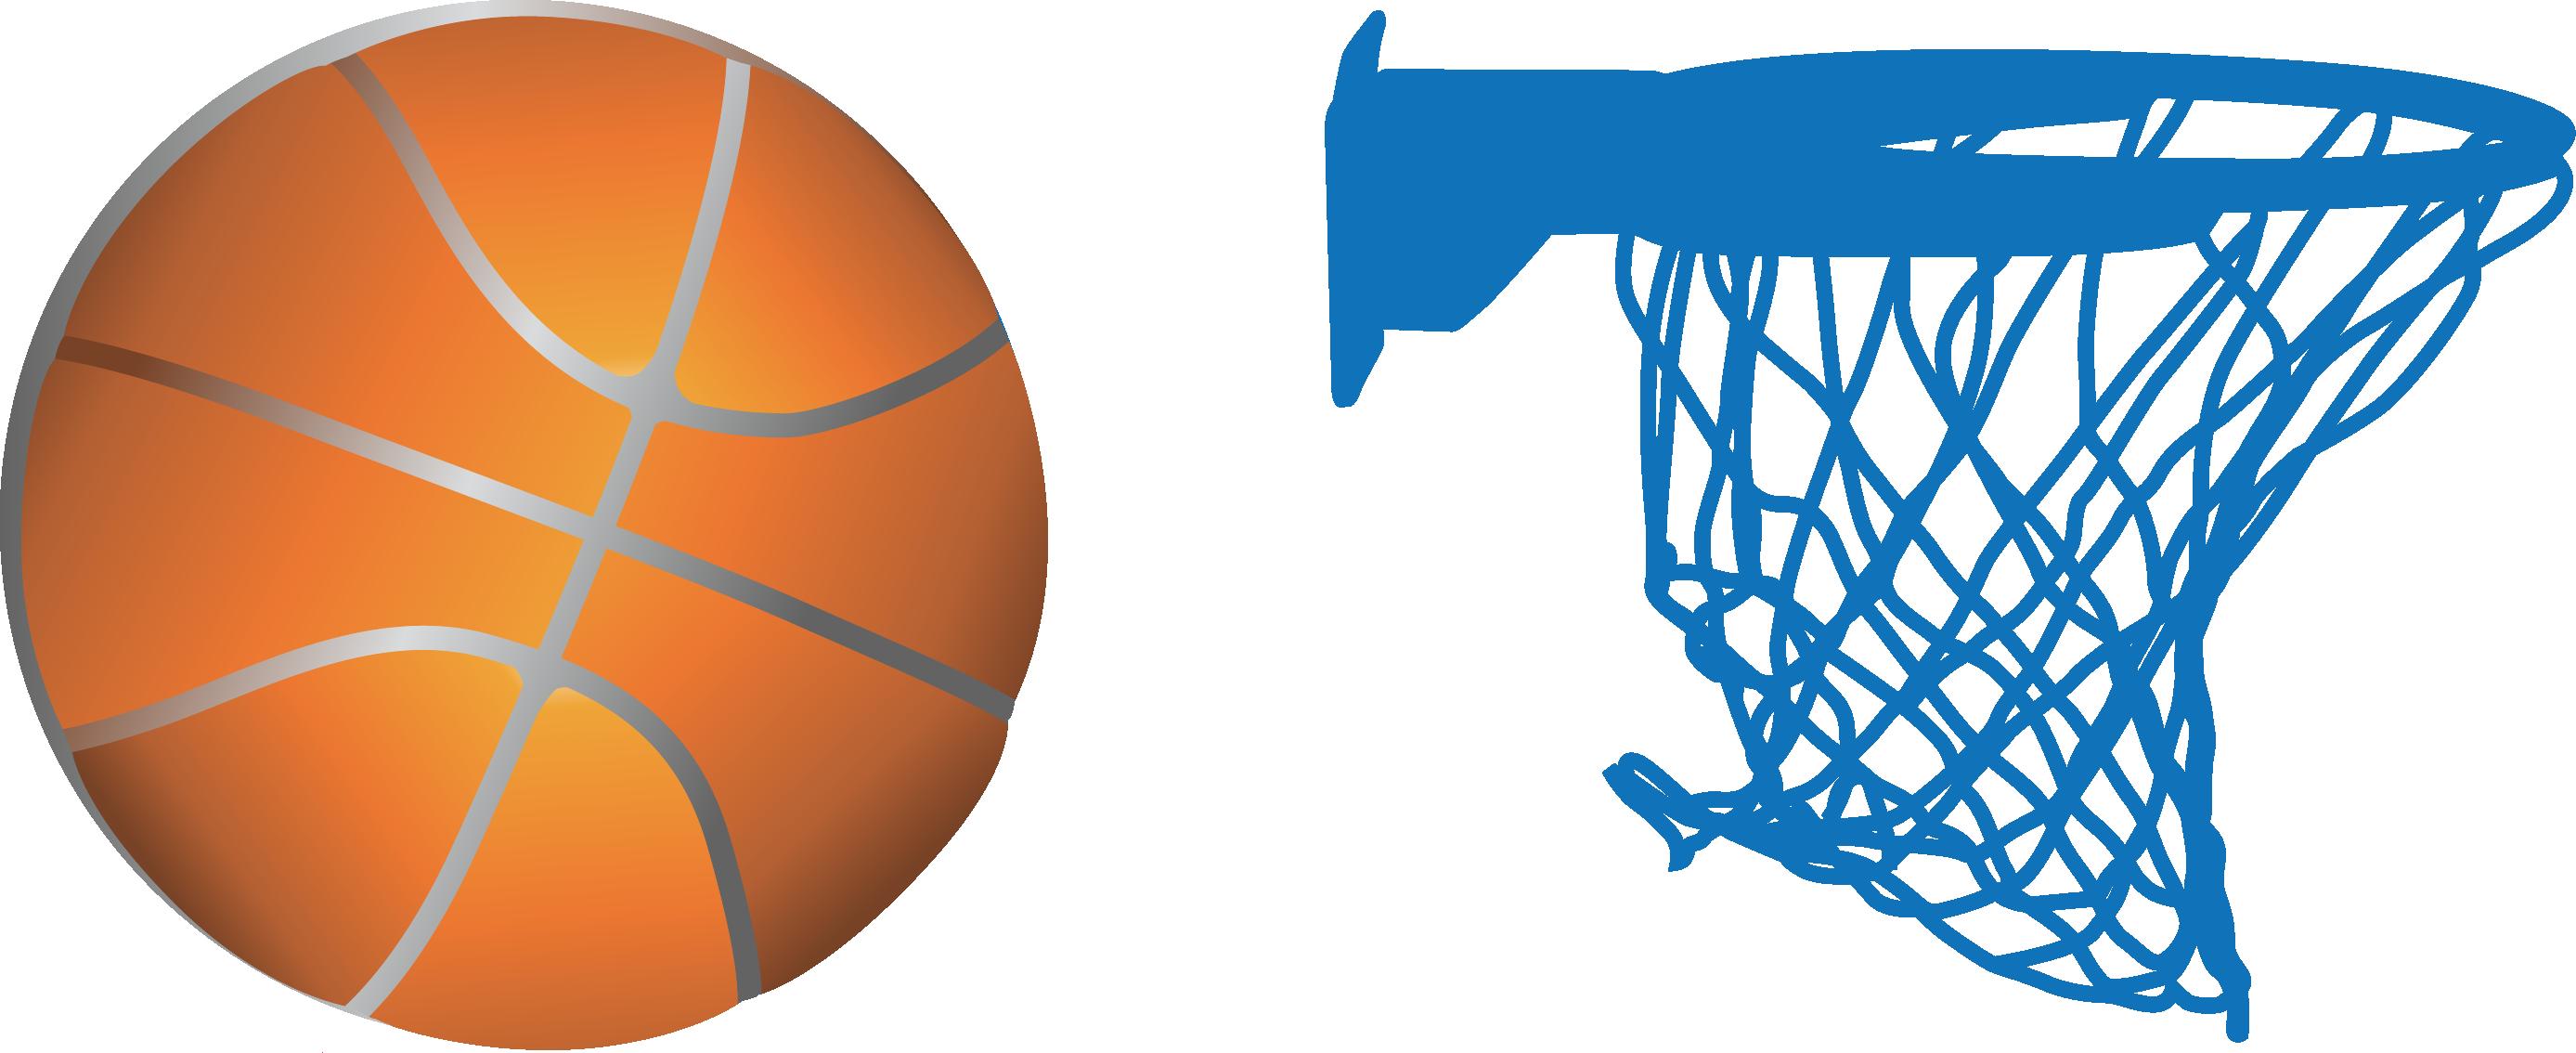 Basketball sticker clip art. Court clipart covered court